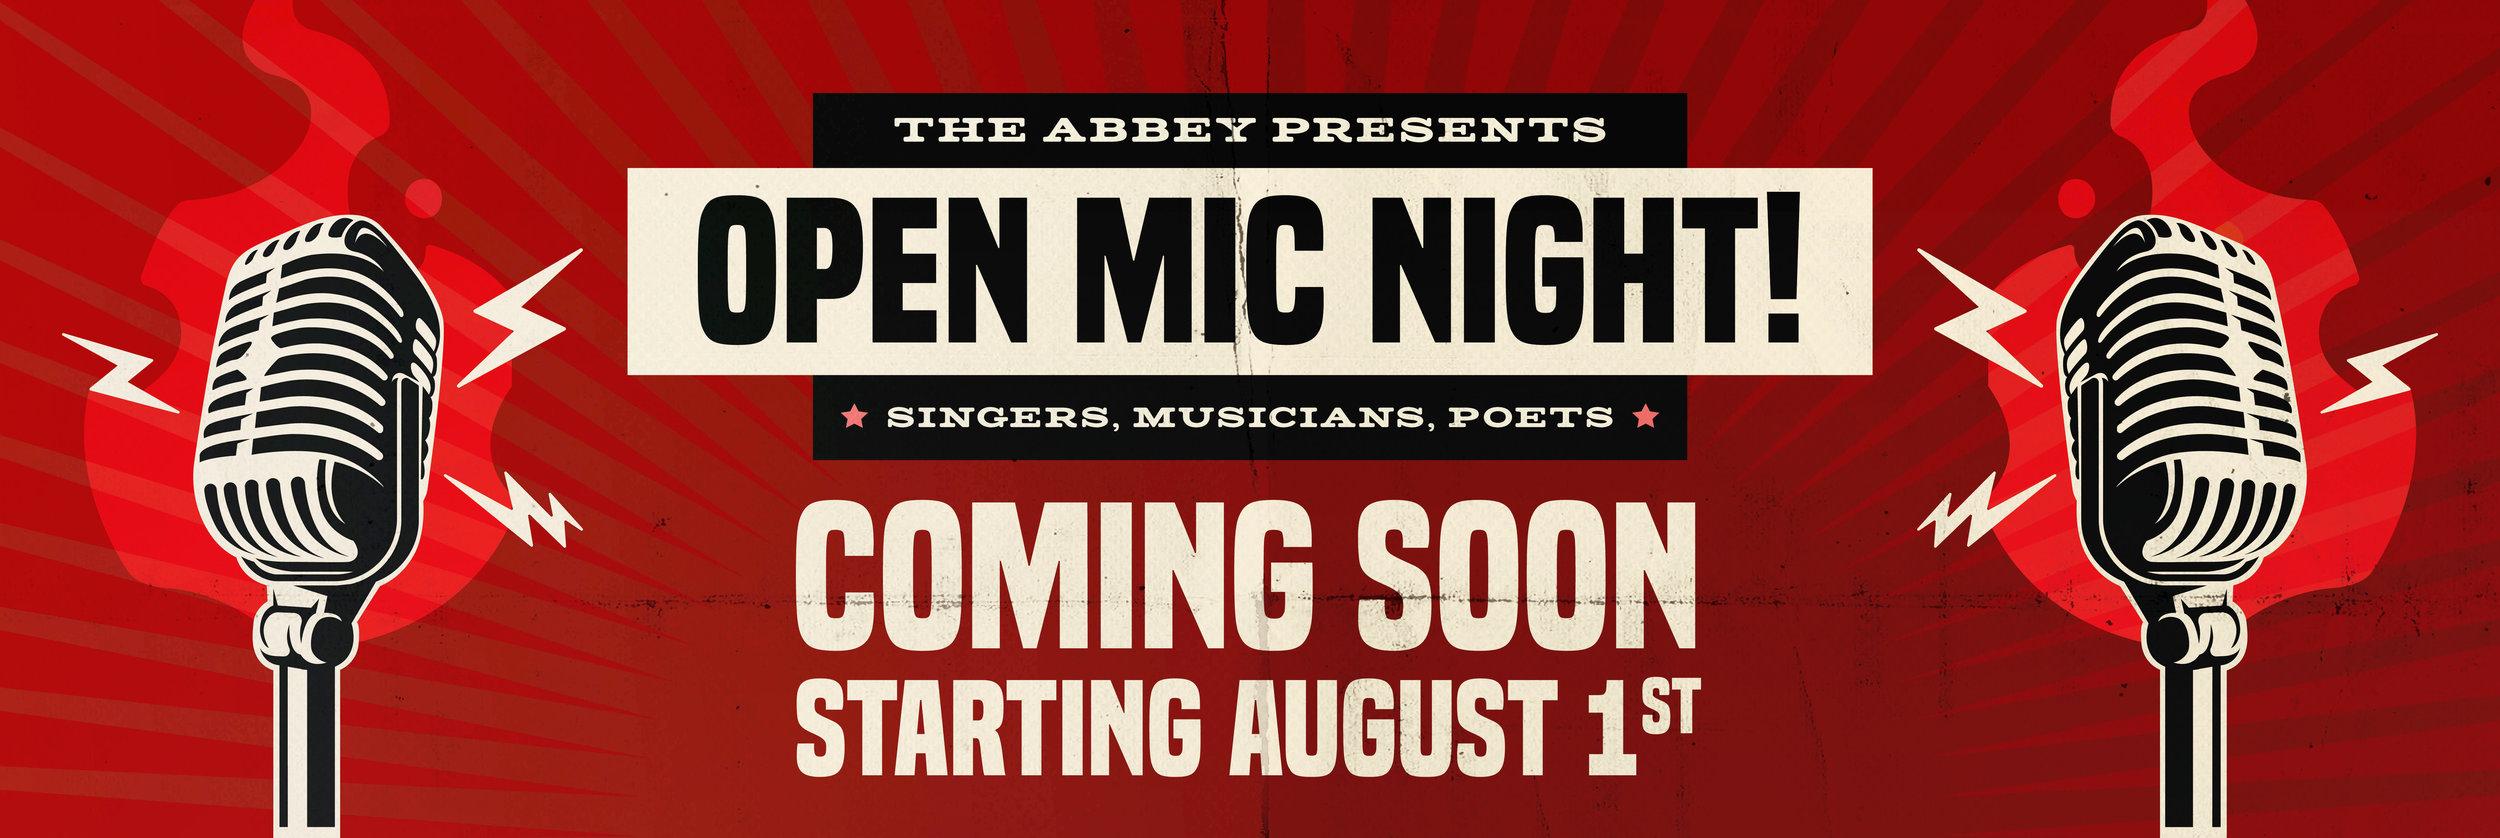 Open Mic Night Web Banner2.jpg